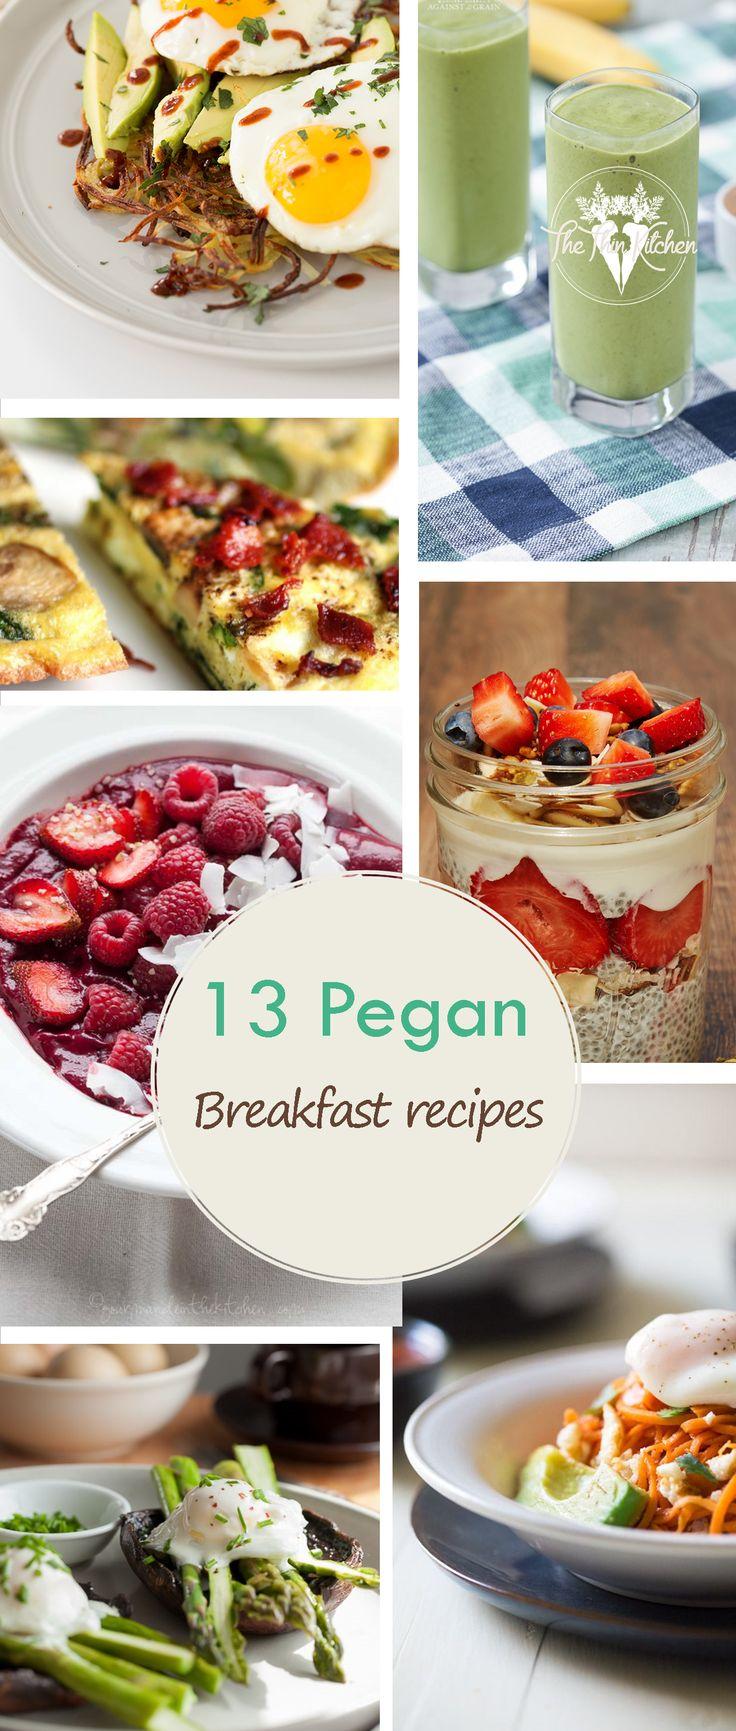 15 best images about pegan diet on pinterest paleo diet paleo vegan and kidney beans. Black Bedroom Furniture Sets. Home Design Ideas